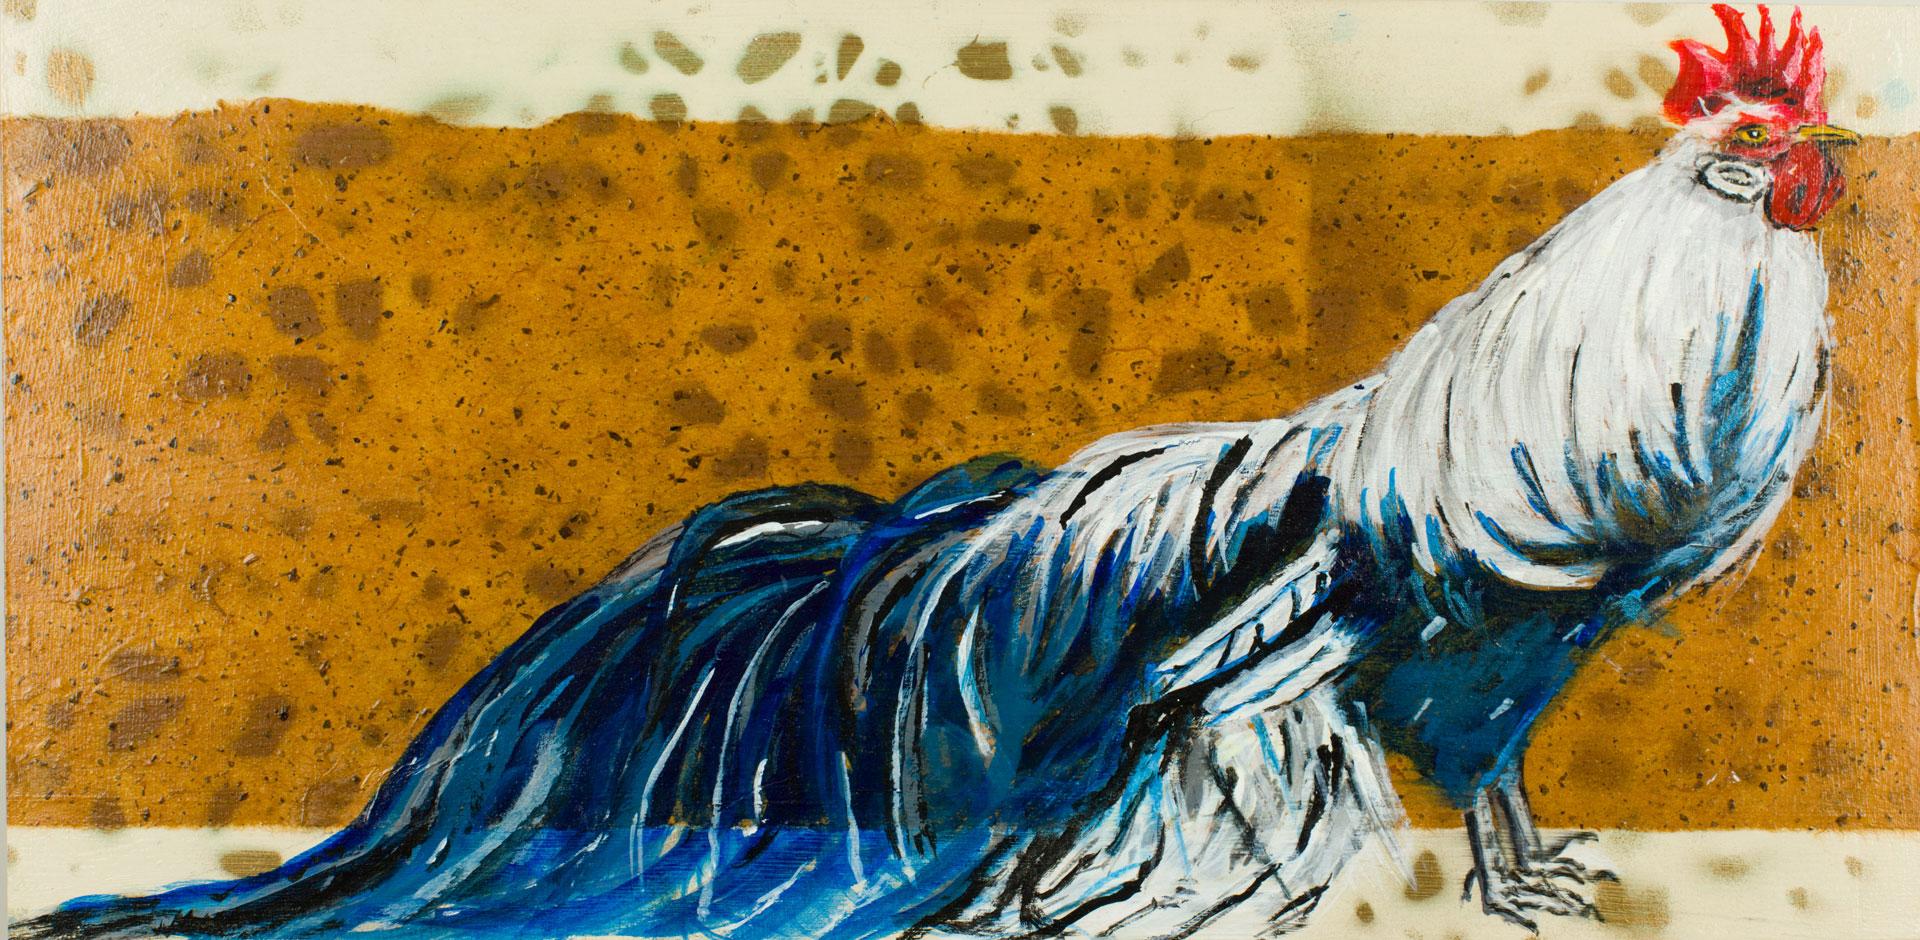 Long Tail: Blue Phoenix